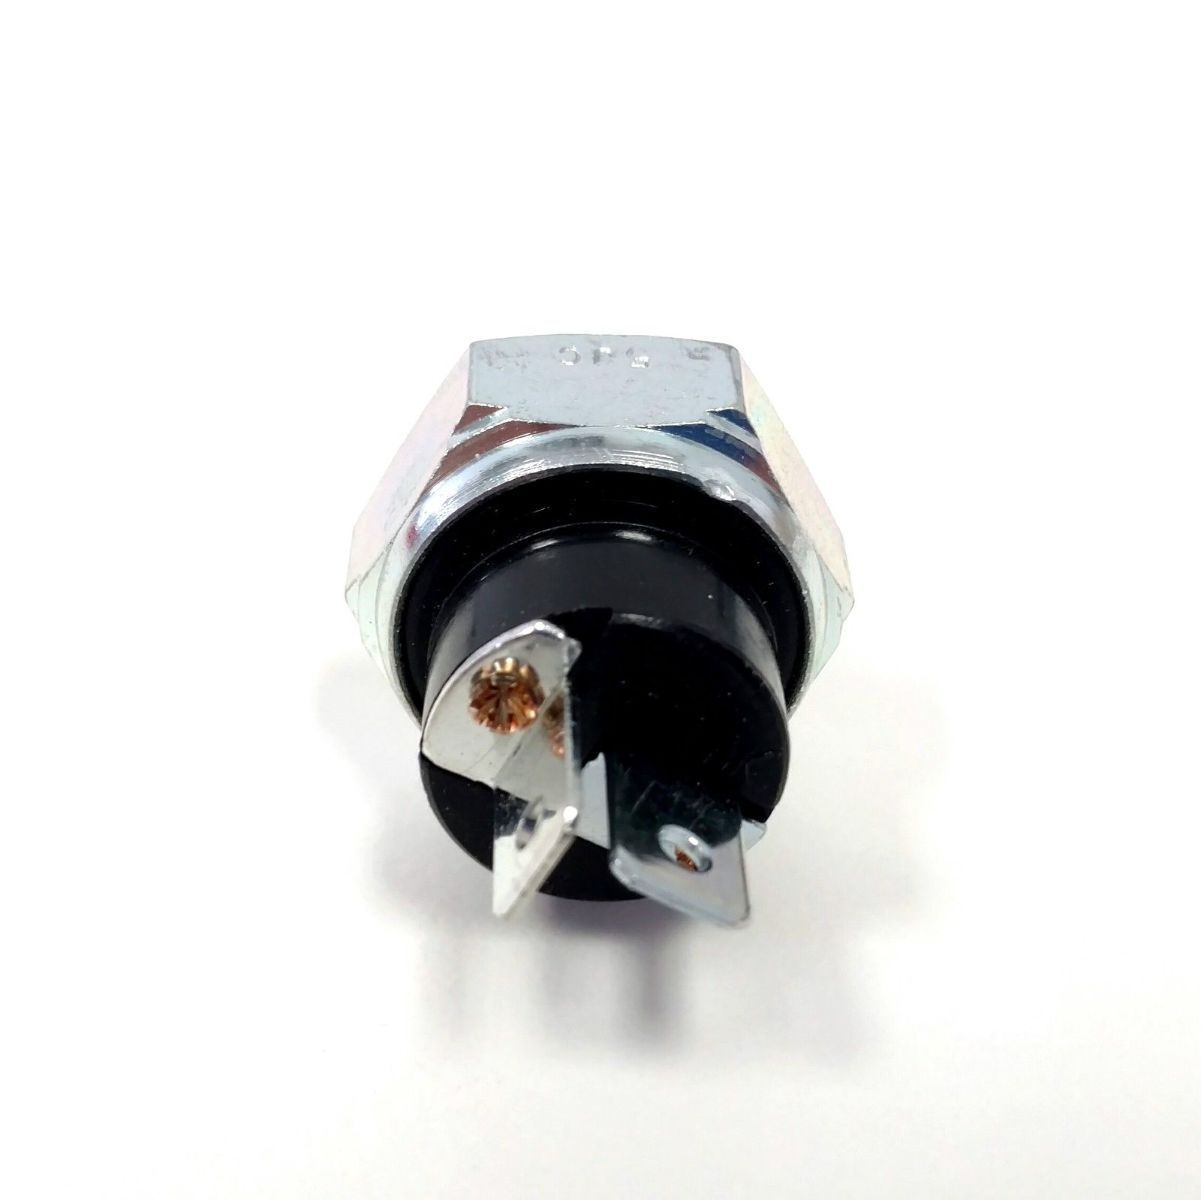 hight resolution of  standard neutral safety switch gmc chevrolet pontiac hot street rat rod ns 18